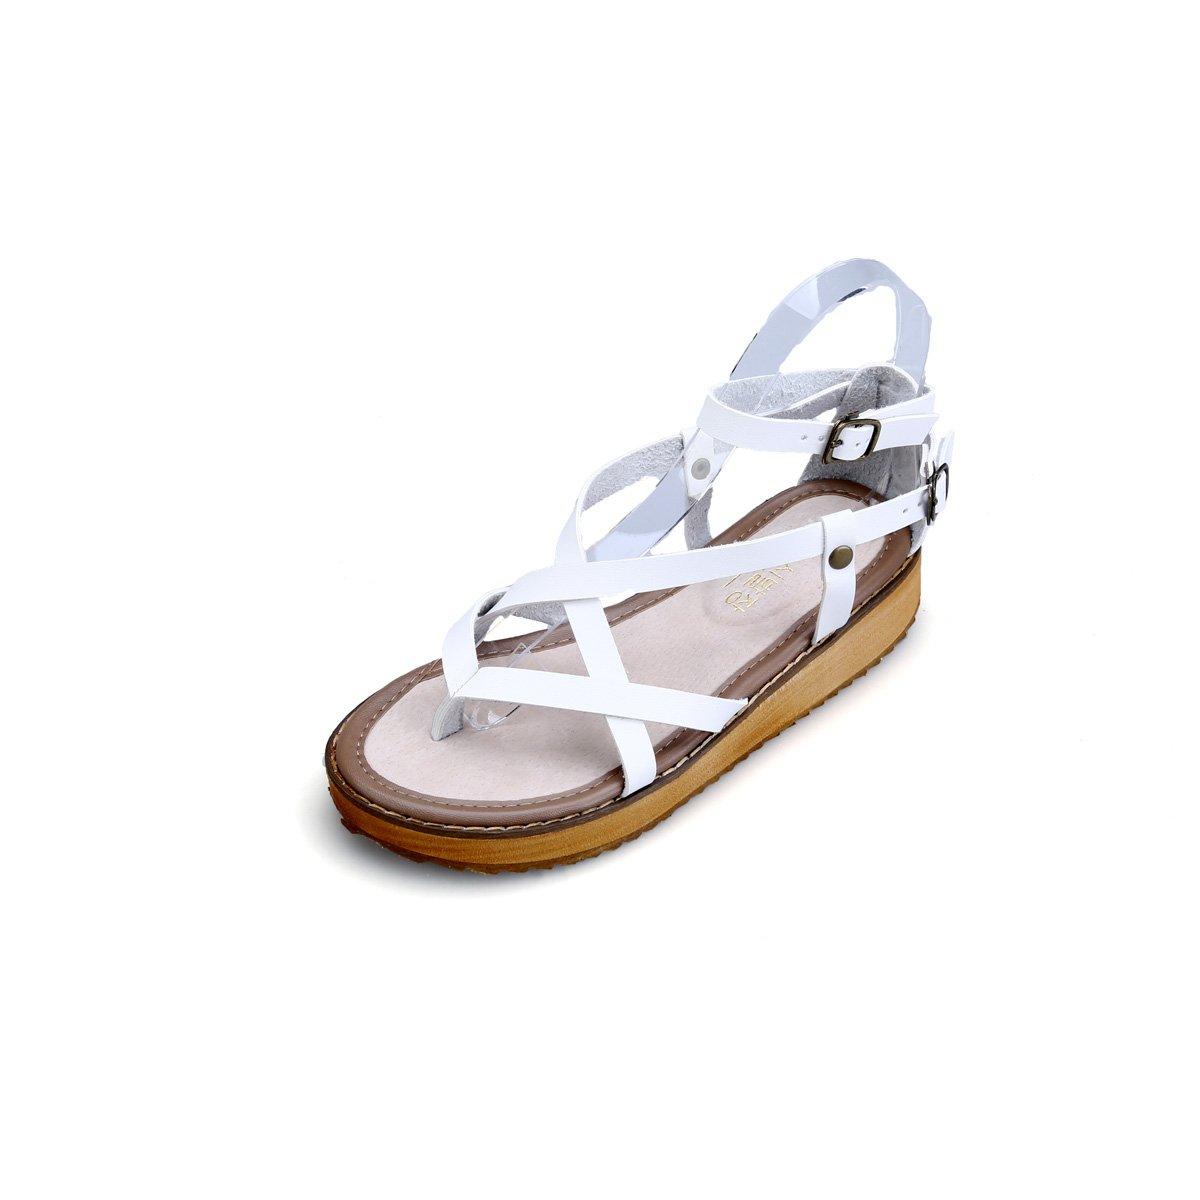 gracosy Damen Sandalen, Sommer Leder Pantoletten Flach Sandalen Damen Slip-Ons Vintage Slipper Zehentrenner Clogs Bequem Blume Sommerschuhe  36 EU|Wei?